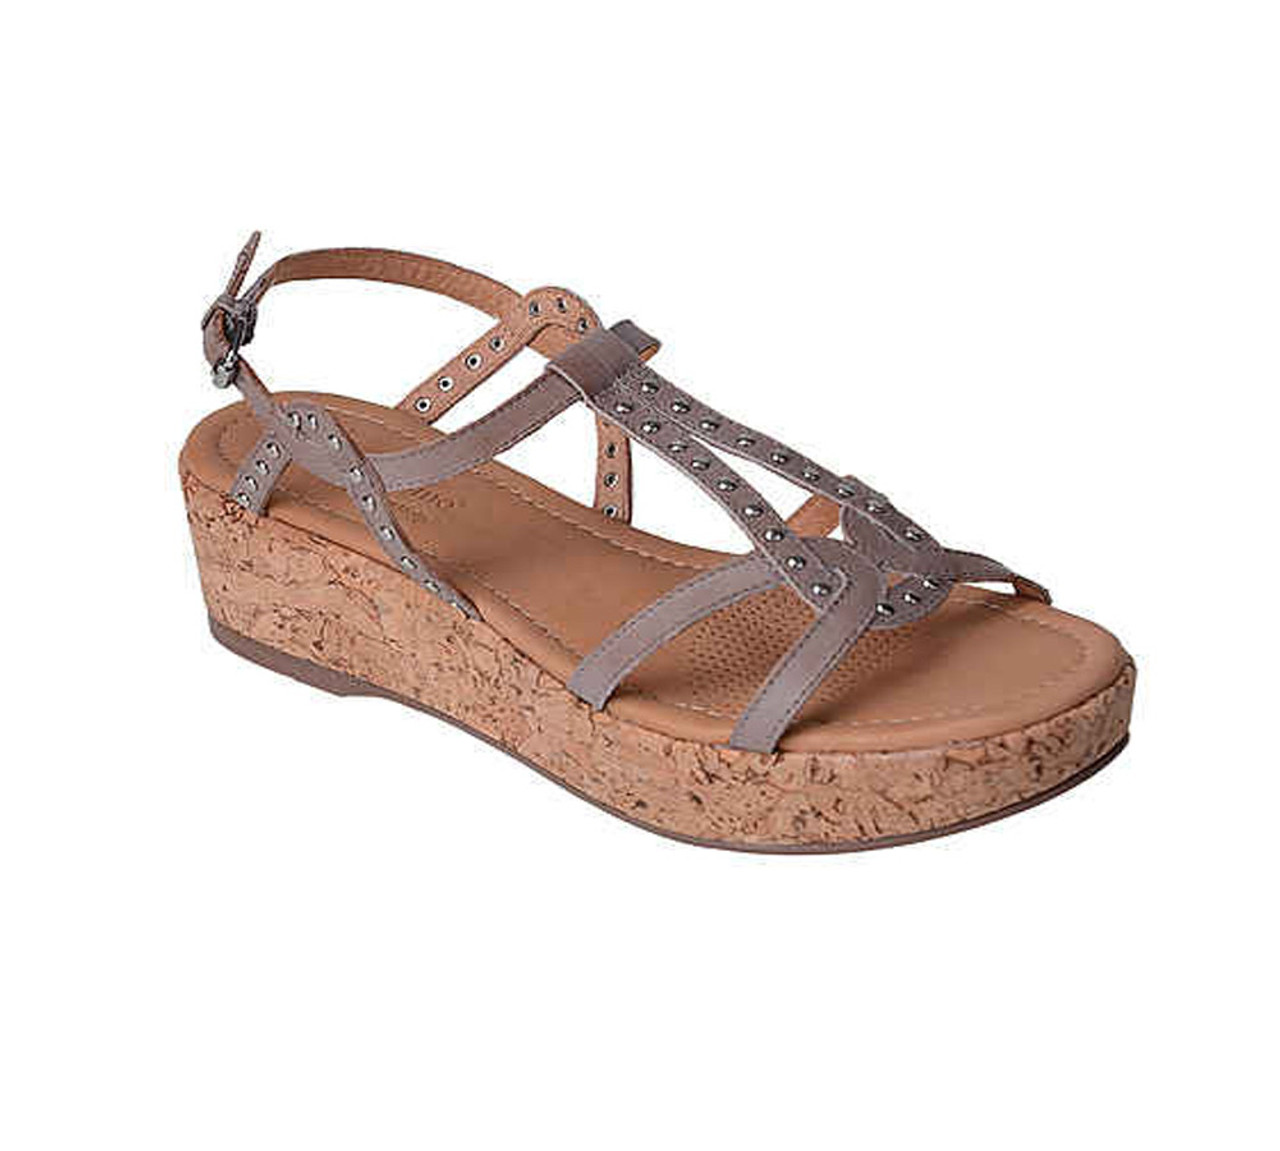 0c457c755c Corso Como Women's Sandi Sandal Taupe Brushed Leather - Shop now @  Shoolu.com